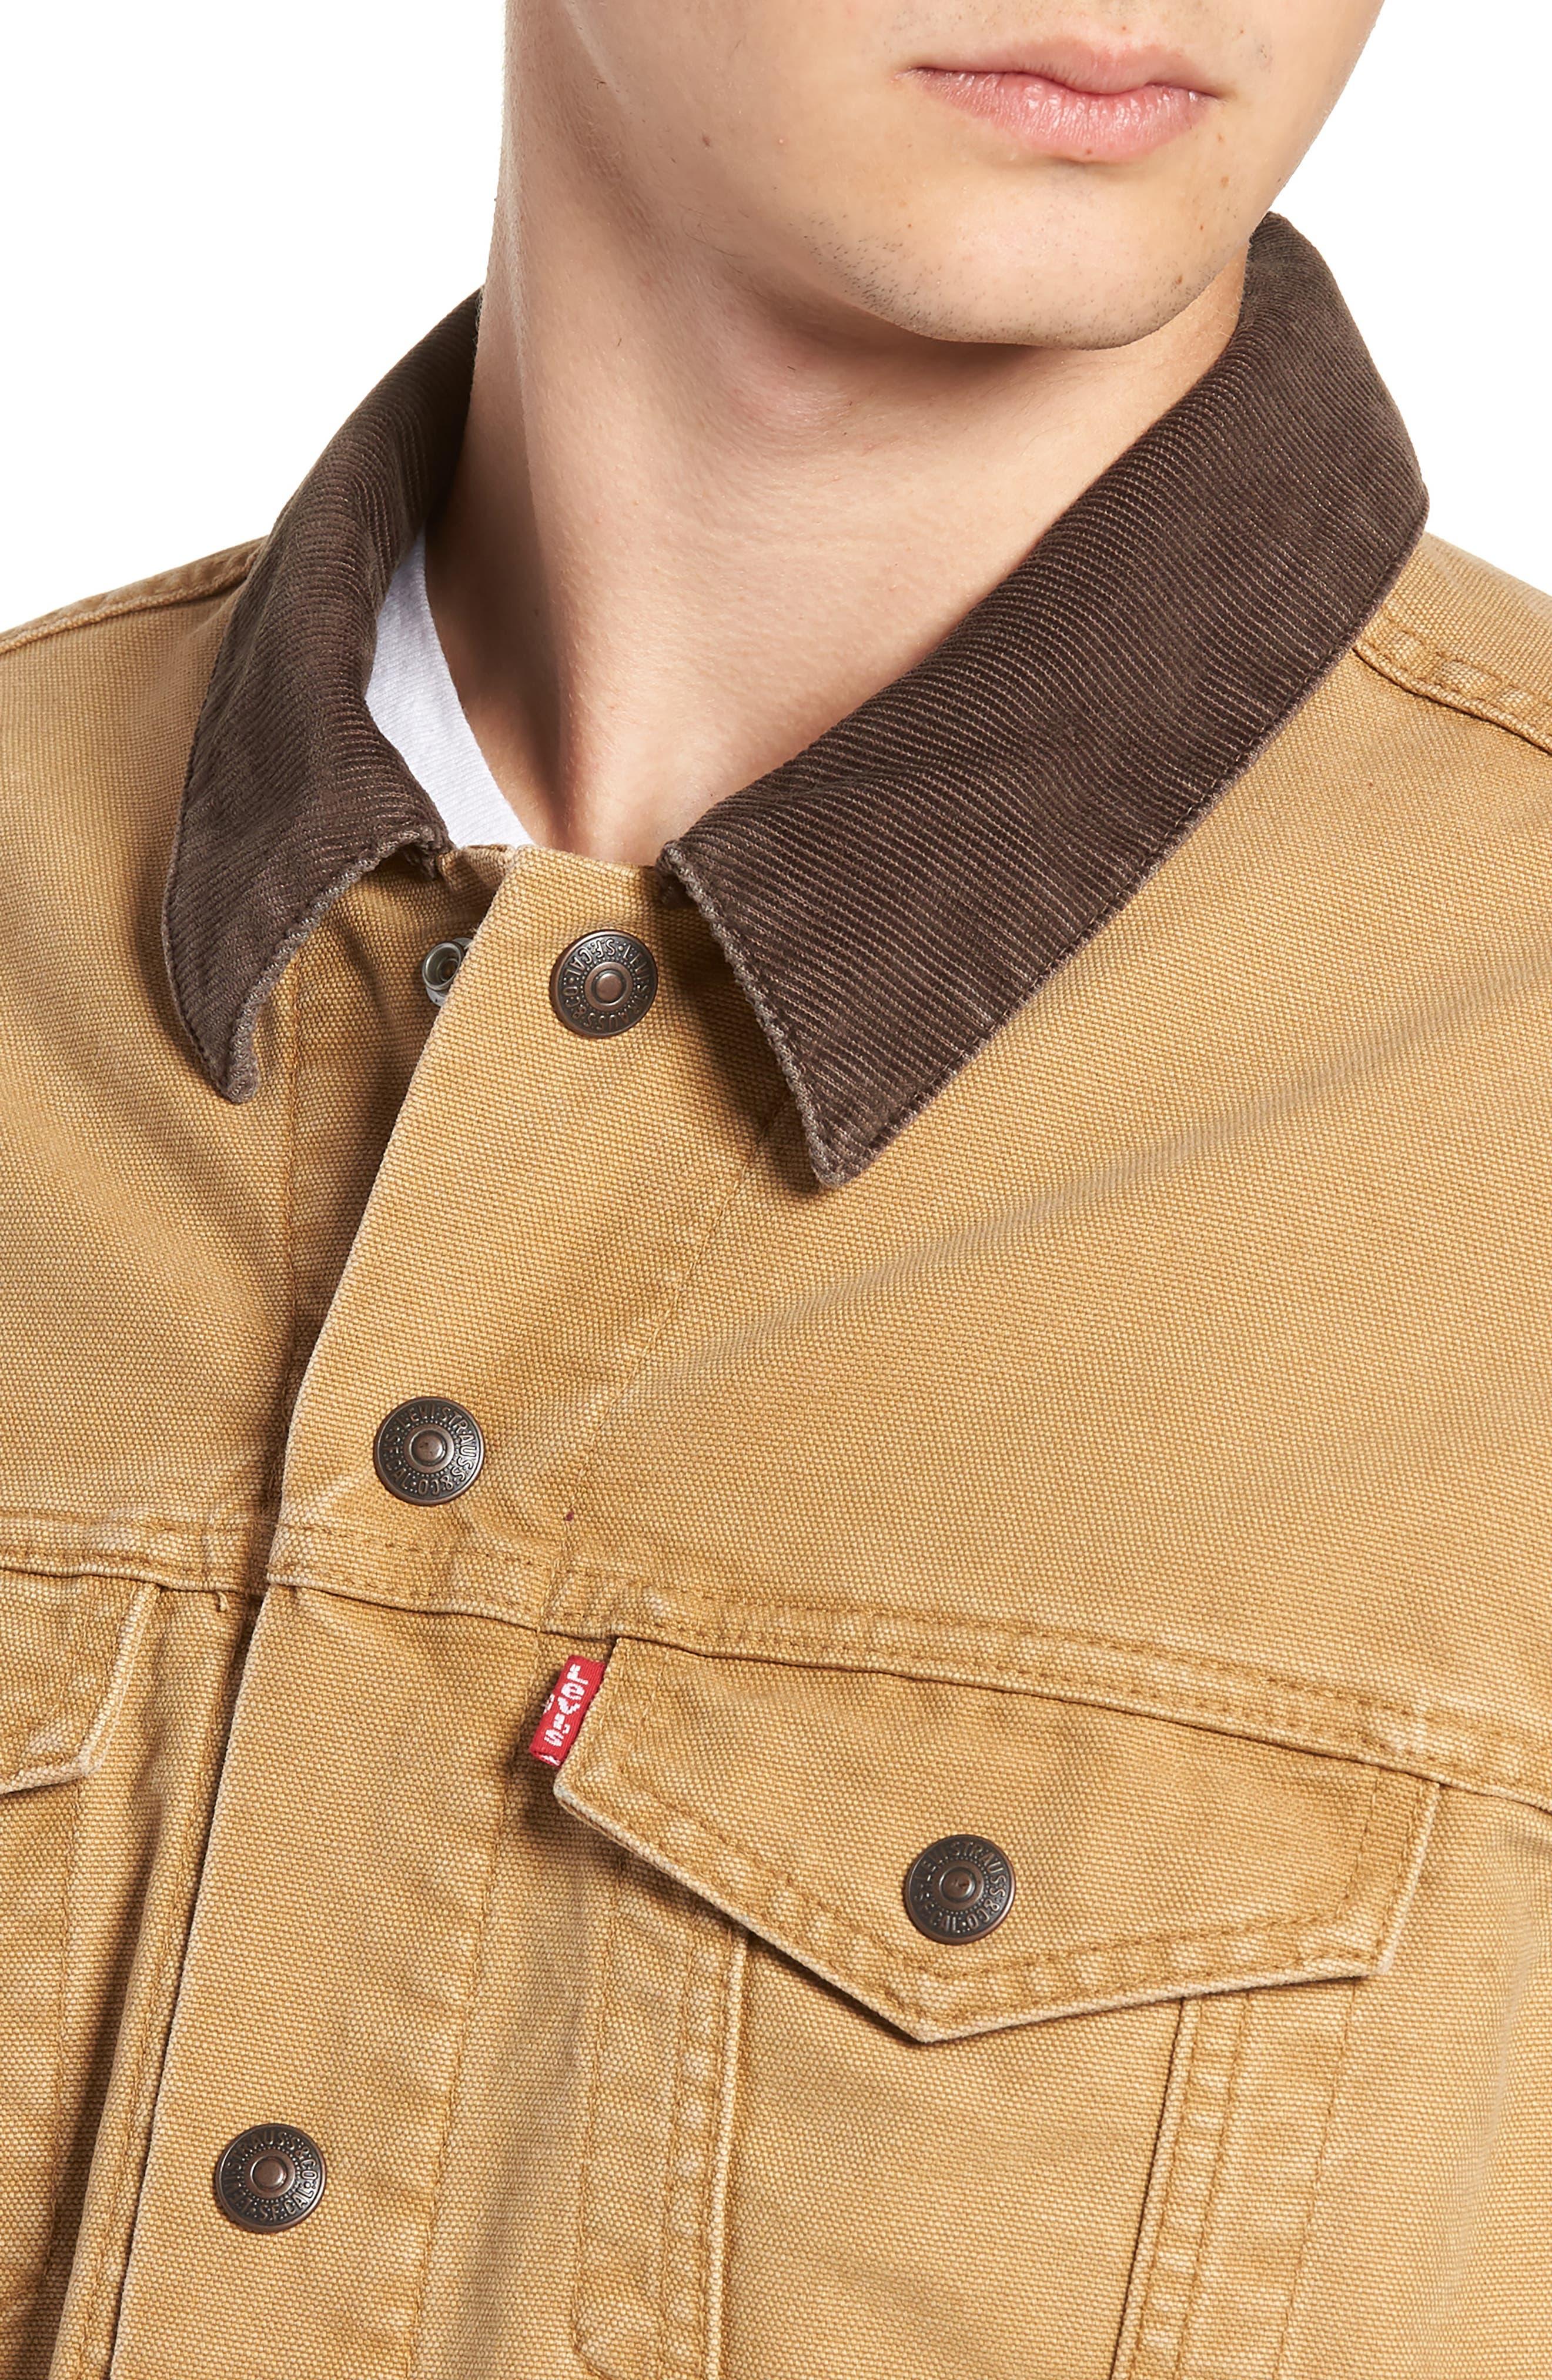 x Justin Timberlake Canvas Trucker Jacket,                             Alternate thumbnail 6, color,                             DIJON